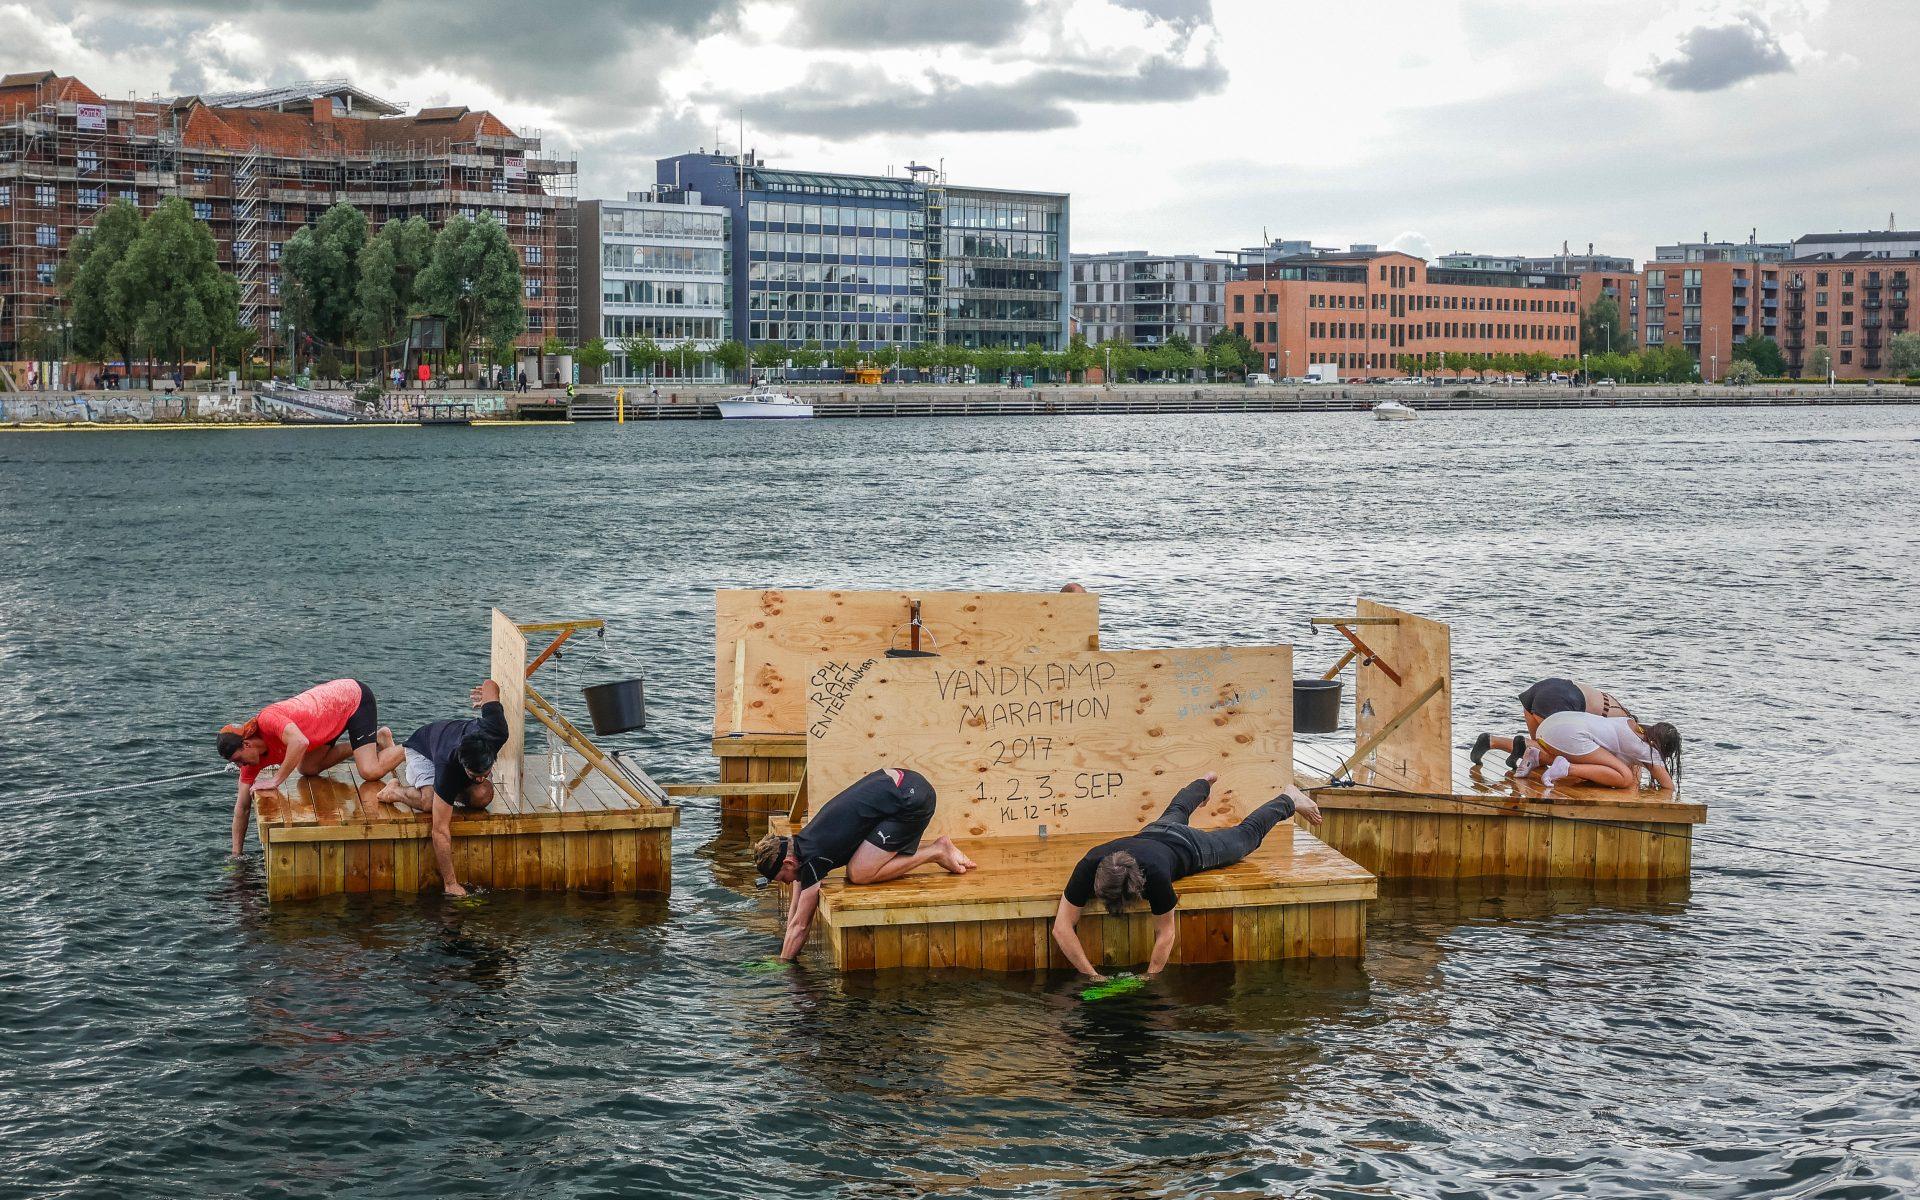 kulturhavn365_vandkamp-marathon01